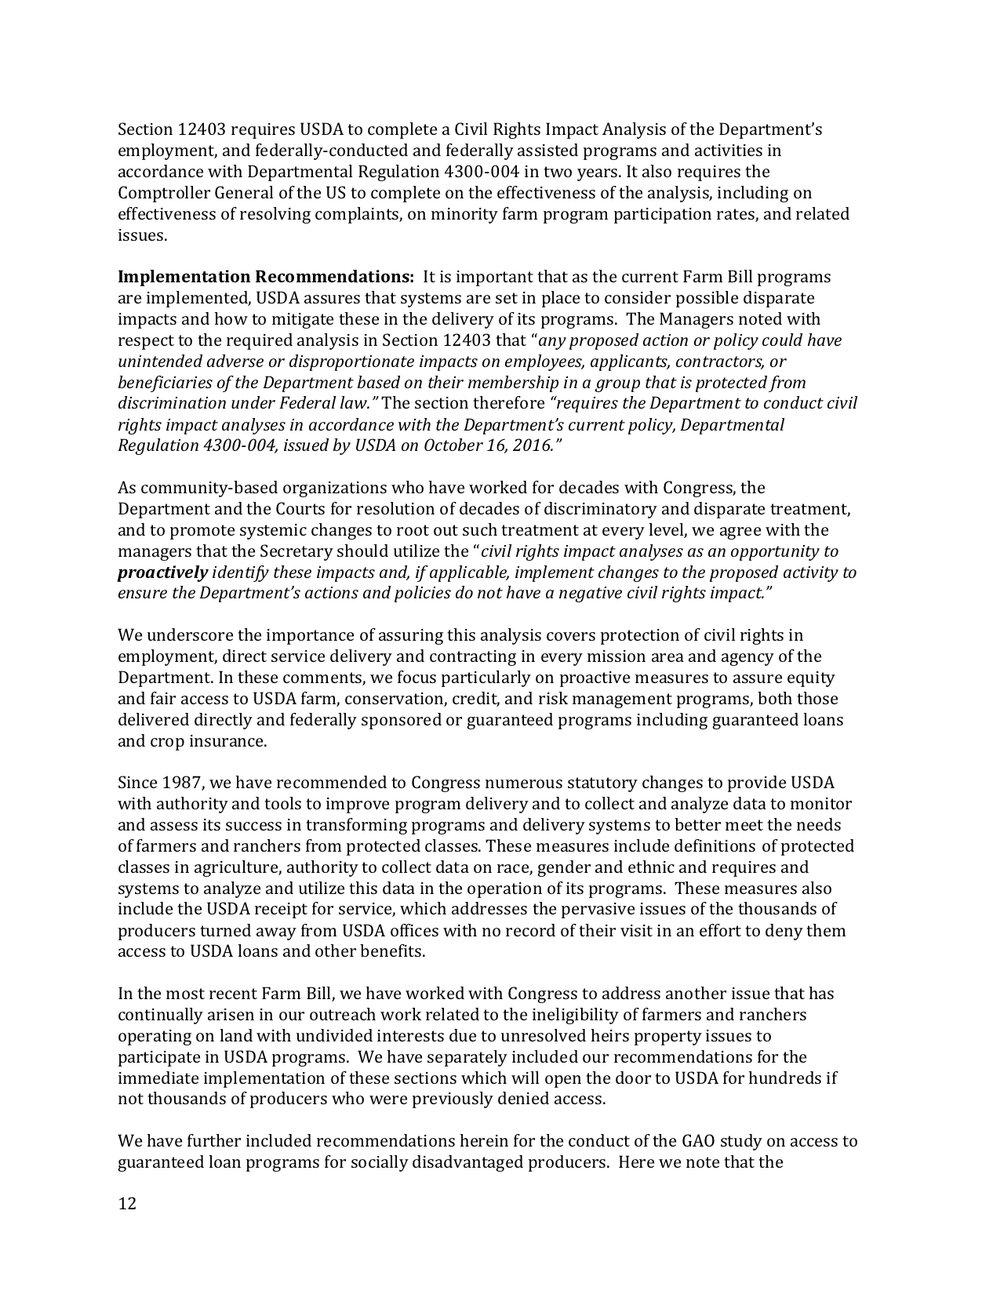 2018 Farm Bill Implementation Recommendations - Rural Co etal final March 1 page 13.jpg